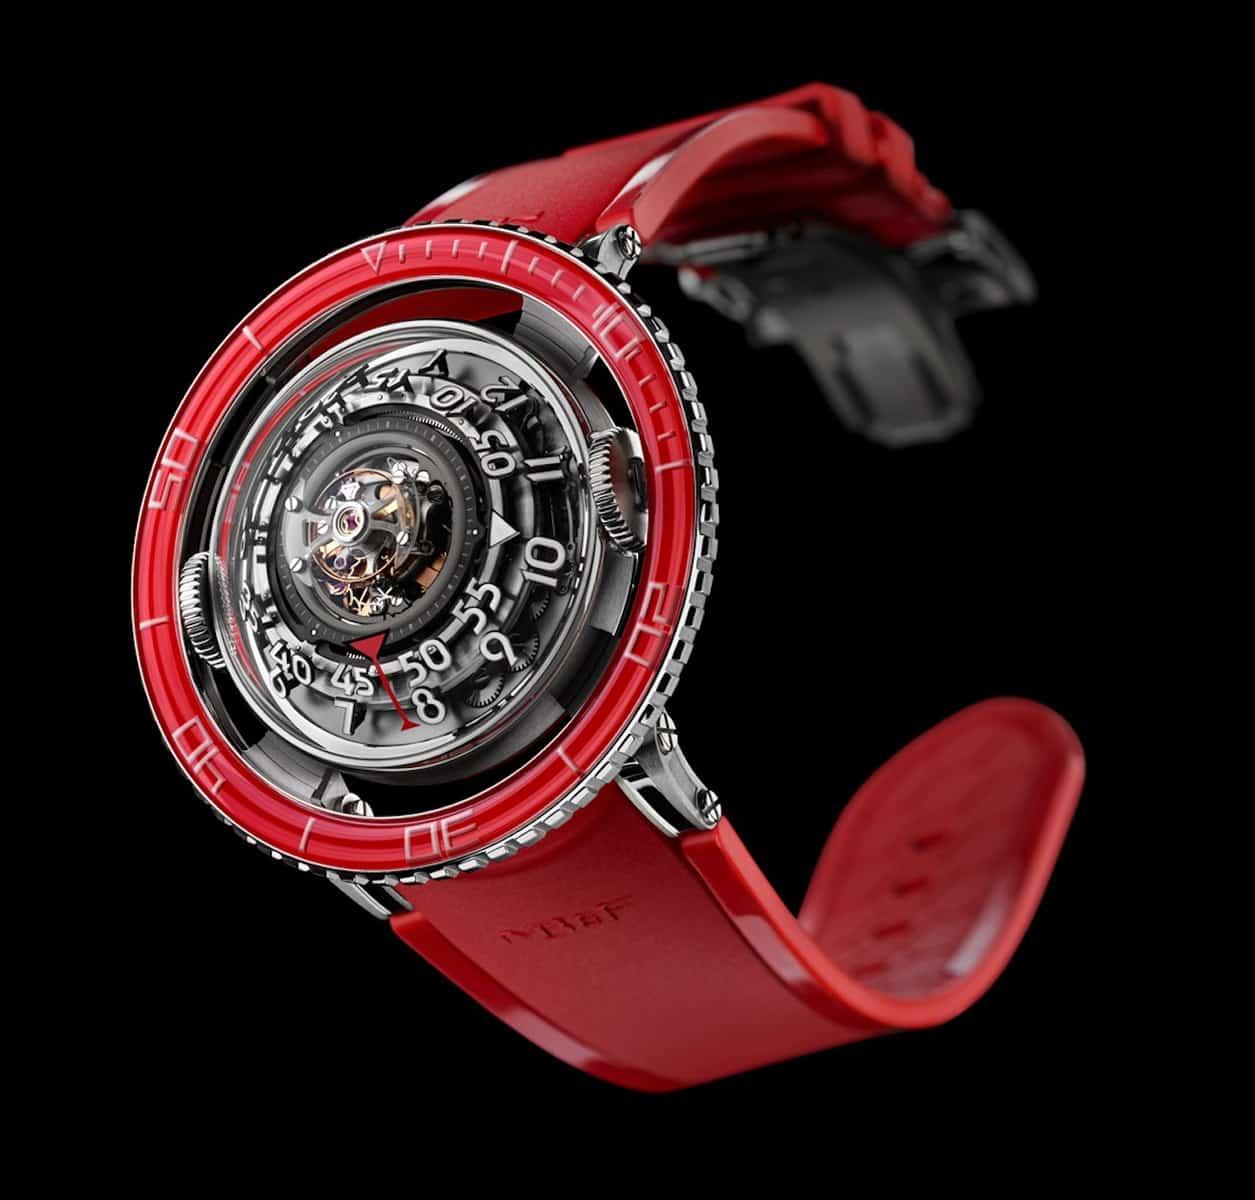 MBF HM7 Aquapod Platinum Red Watch 6